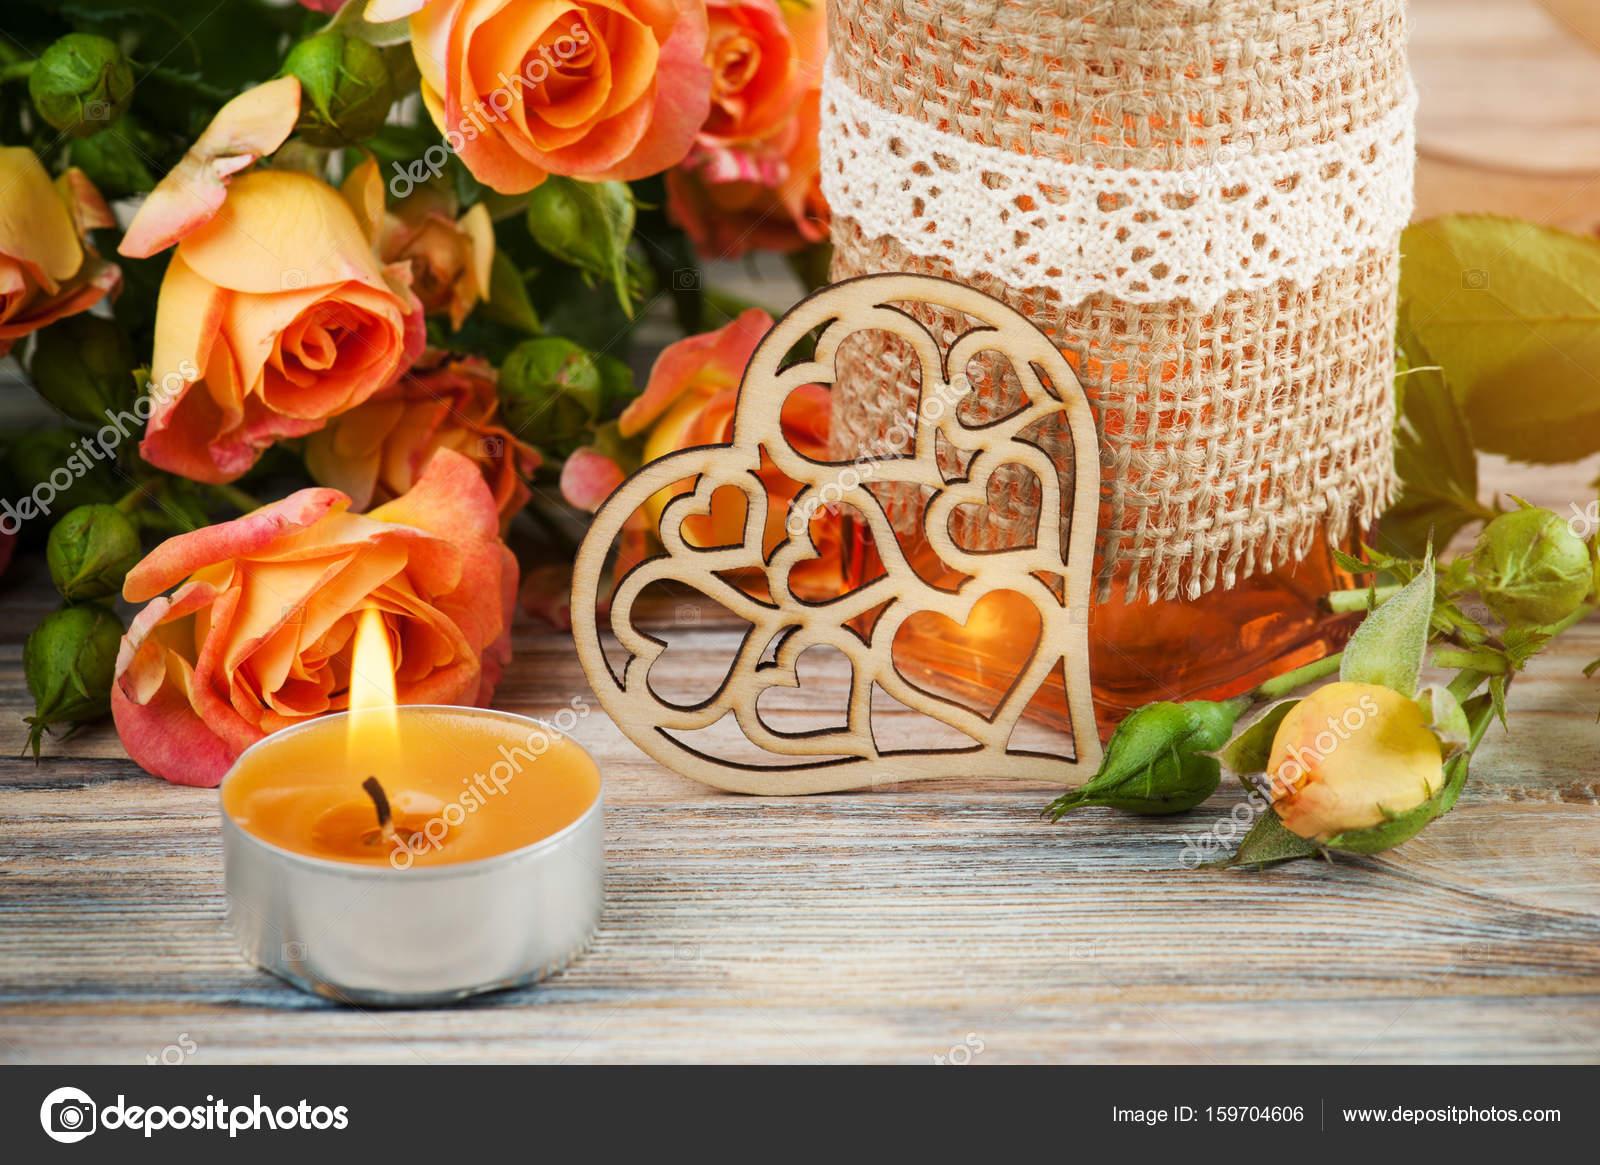 https://st3.depositphotos.com/3608211/15970/i/1600/depositphotos_159704606-stockafbeelding-fris-oranje-rozen-bloemen-hart.jpg